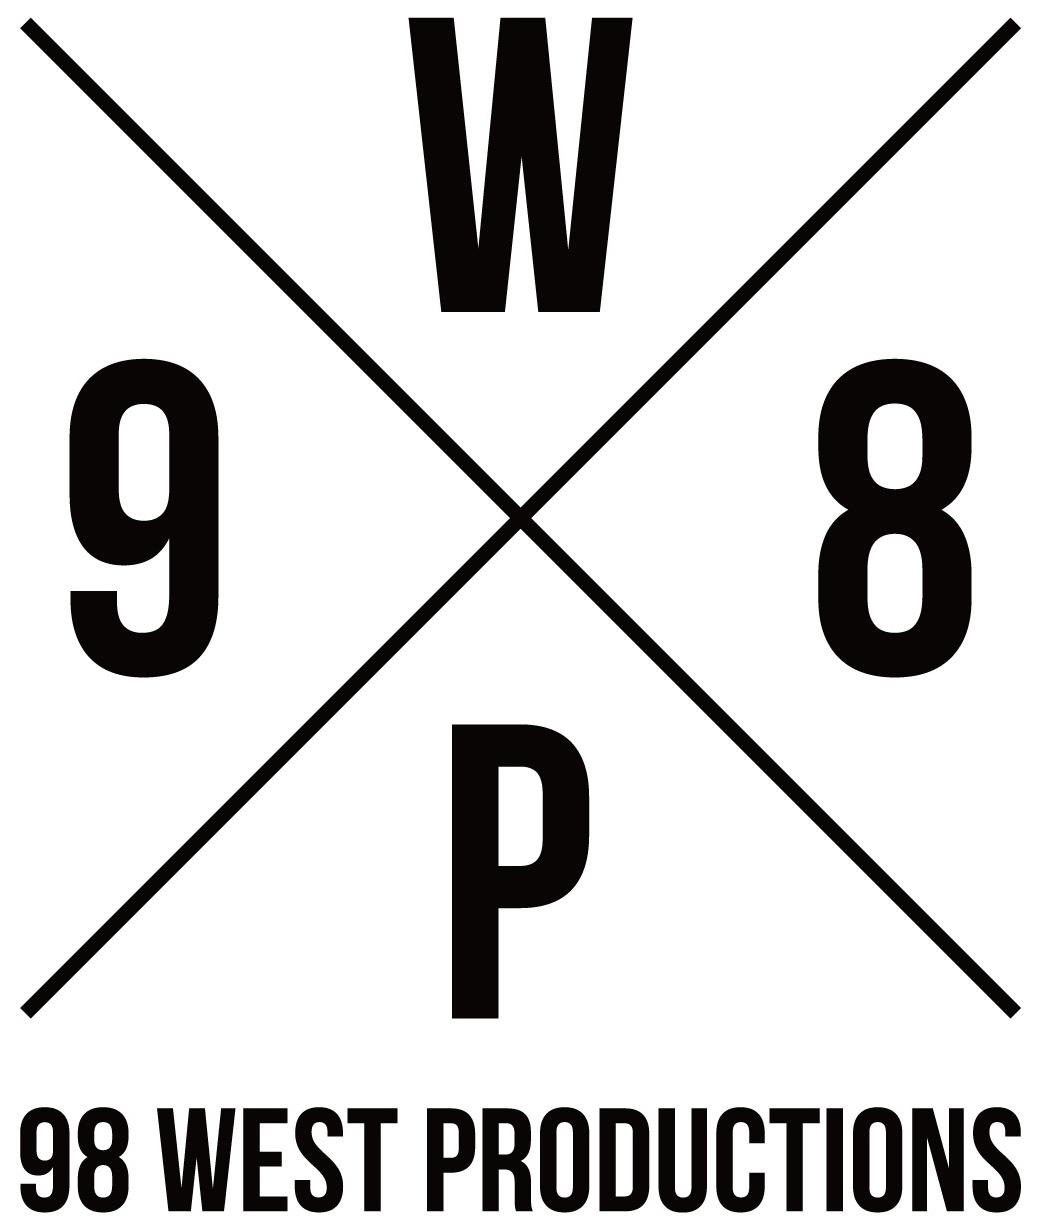 98westproductions.com